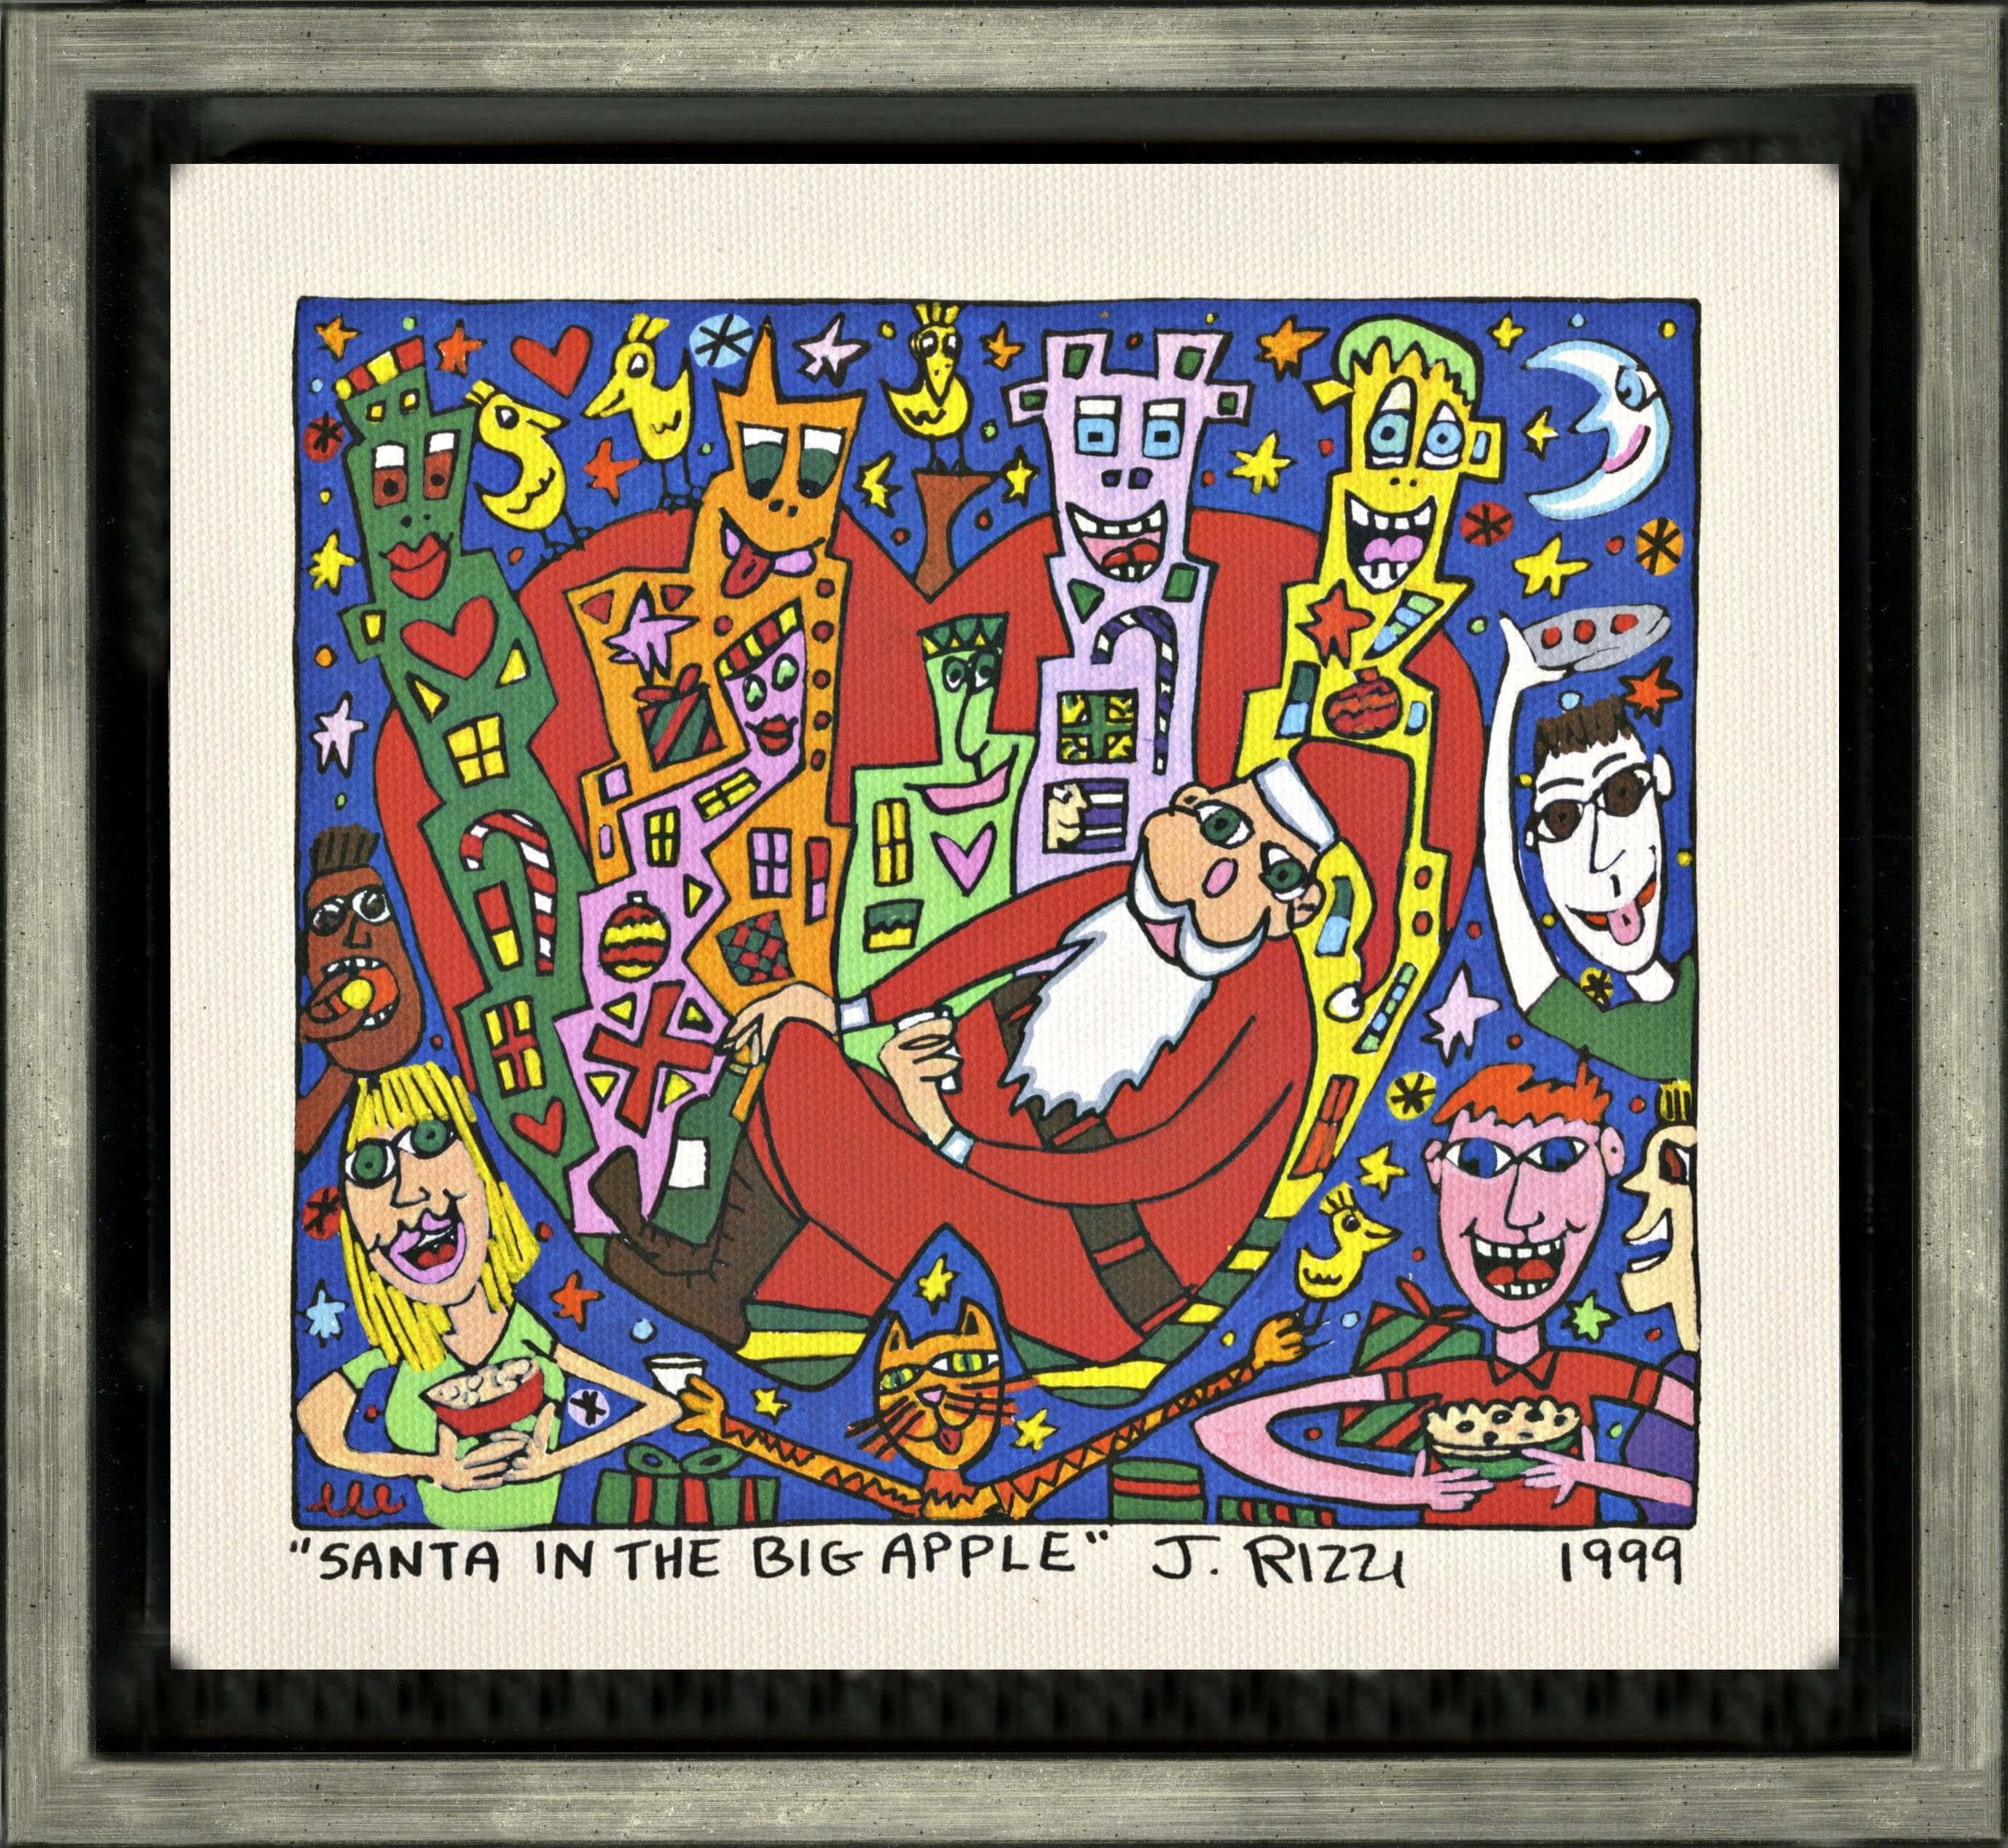 James Rizzi: Santa In The Big Apple